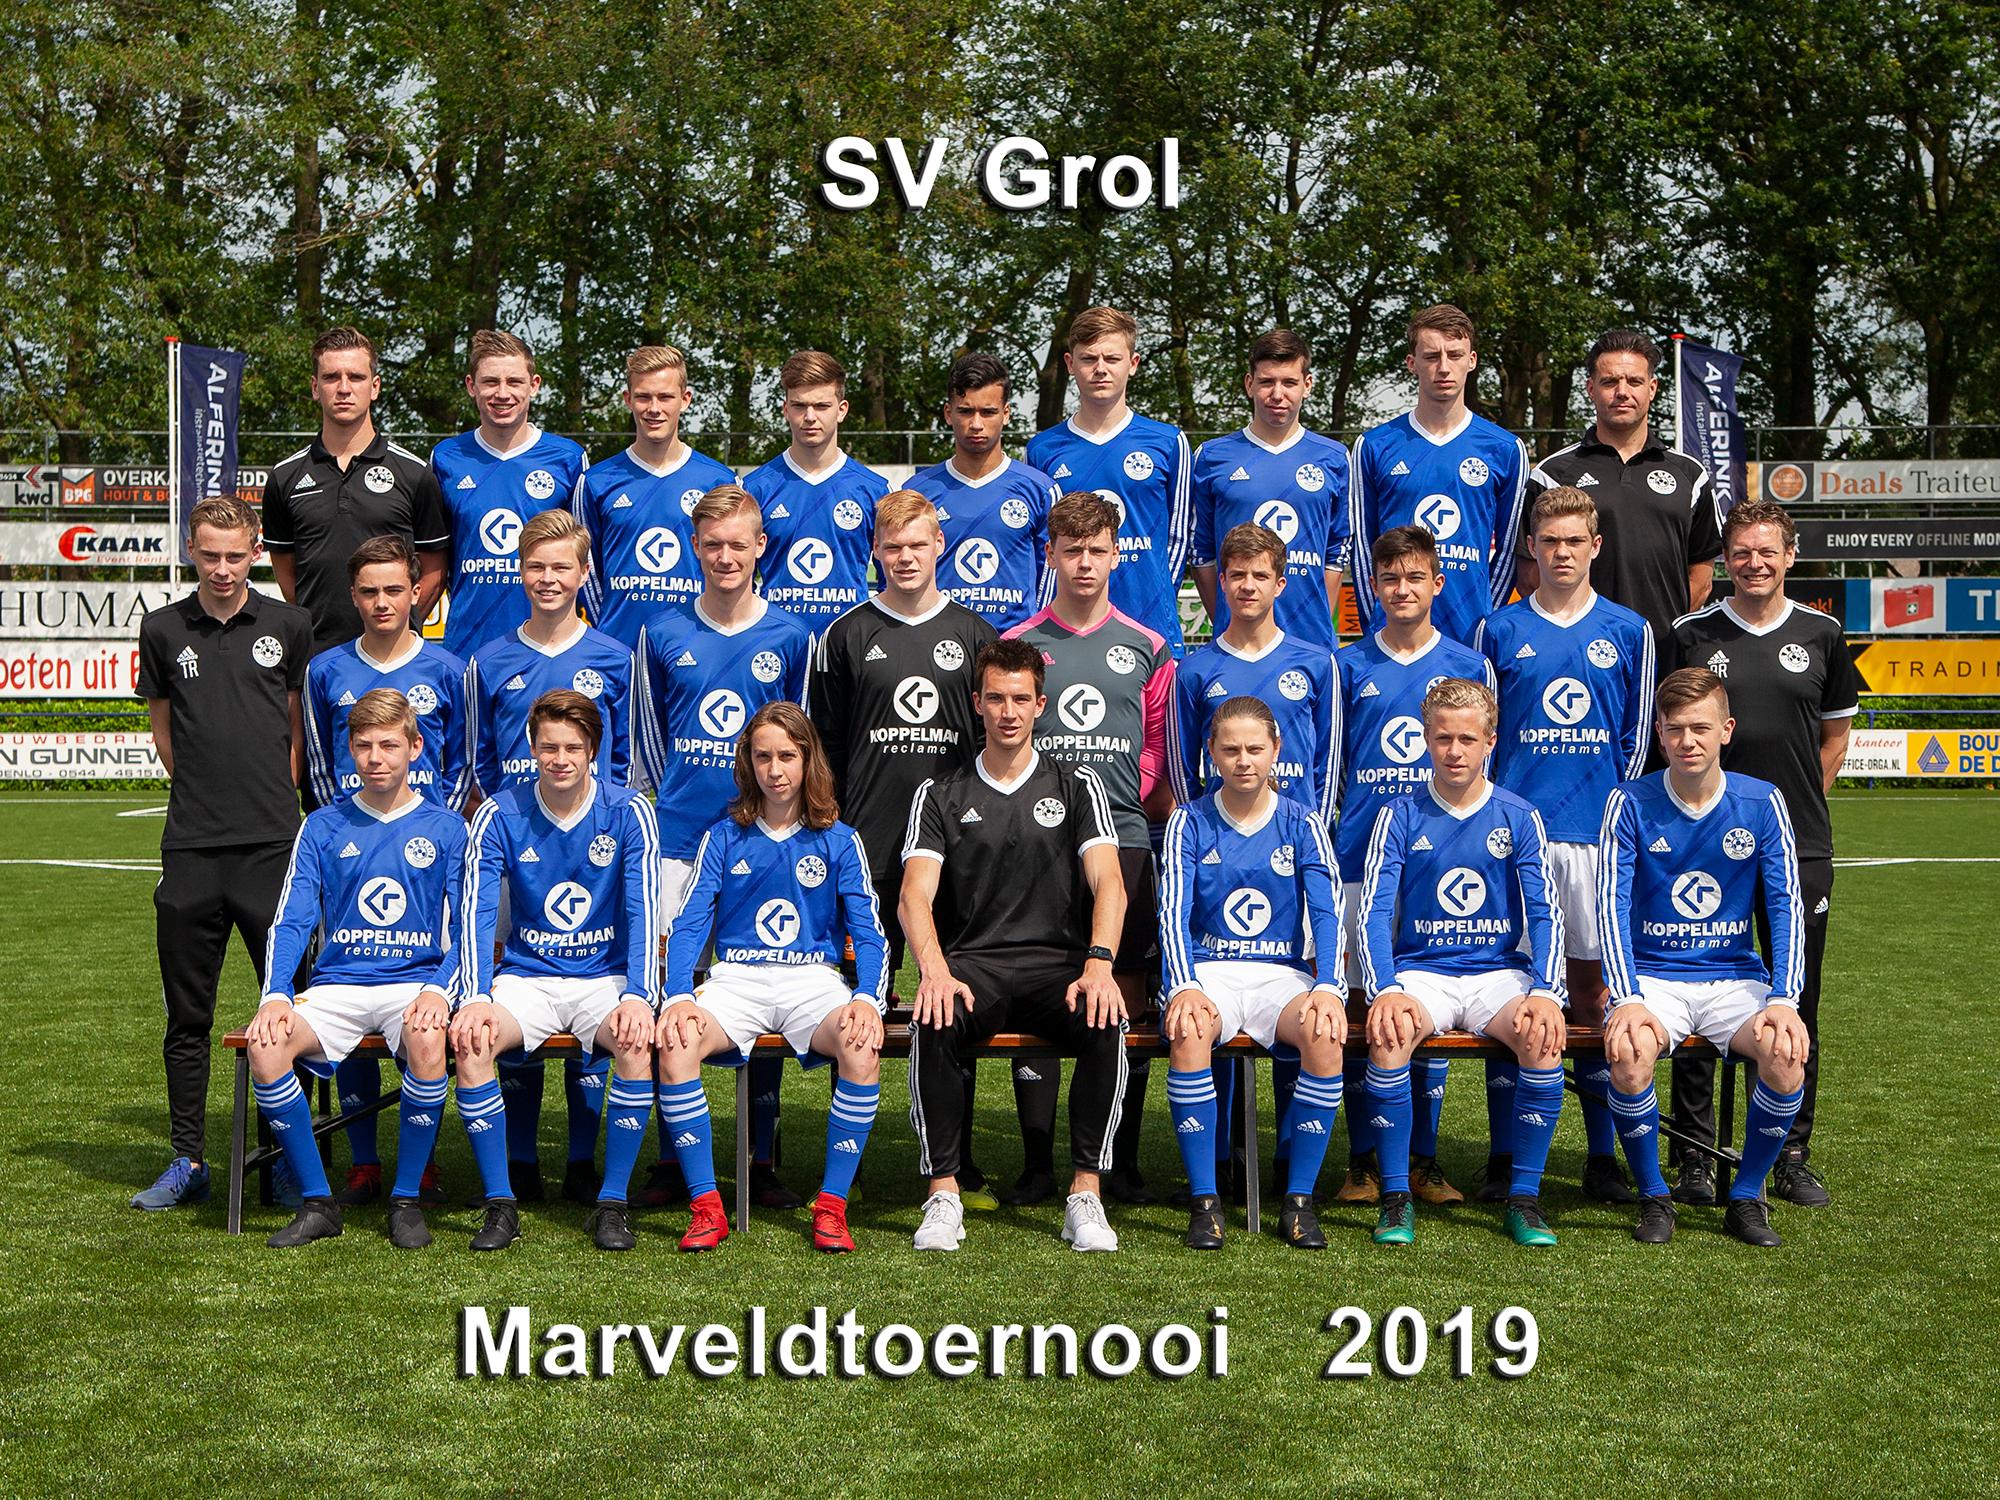 Marveld Tournament 2019 - Team SV Grol